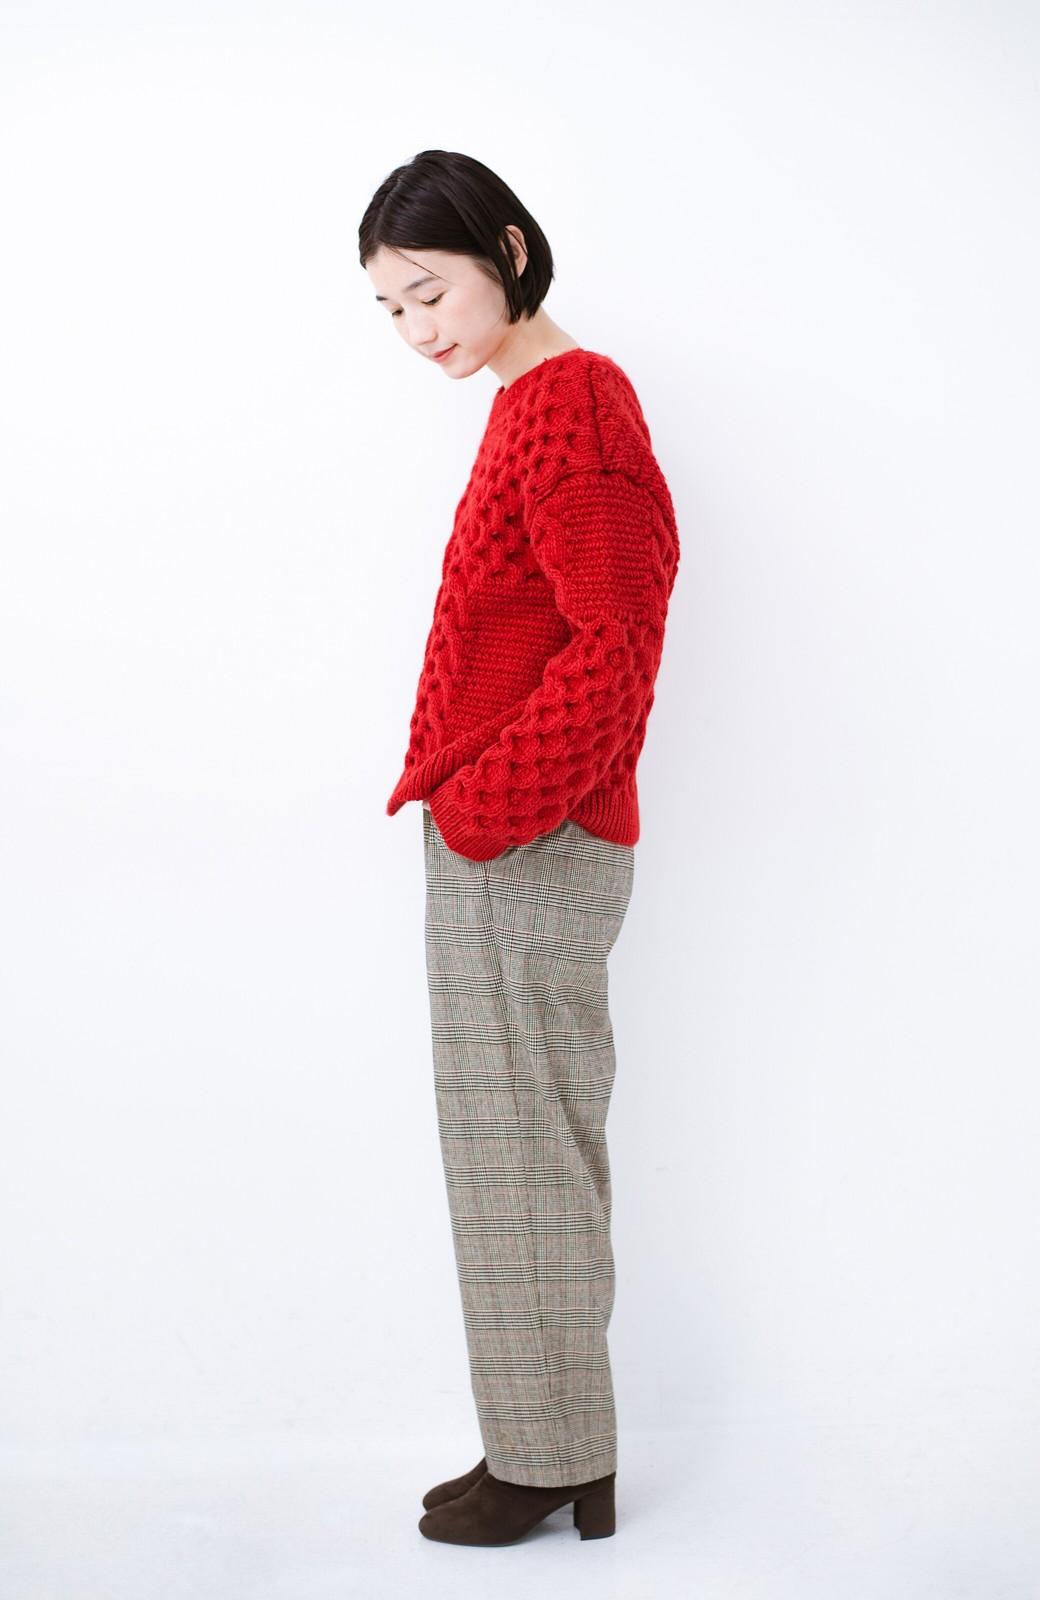 haco! 古着っぽい雰囲気がこなれたパネル編みケーブルニット <レッド>の商品写真9